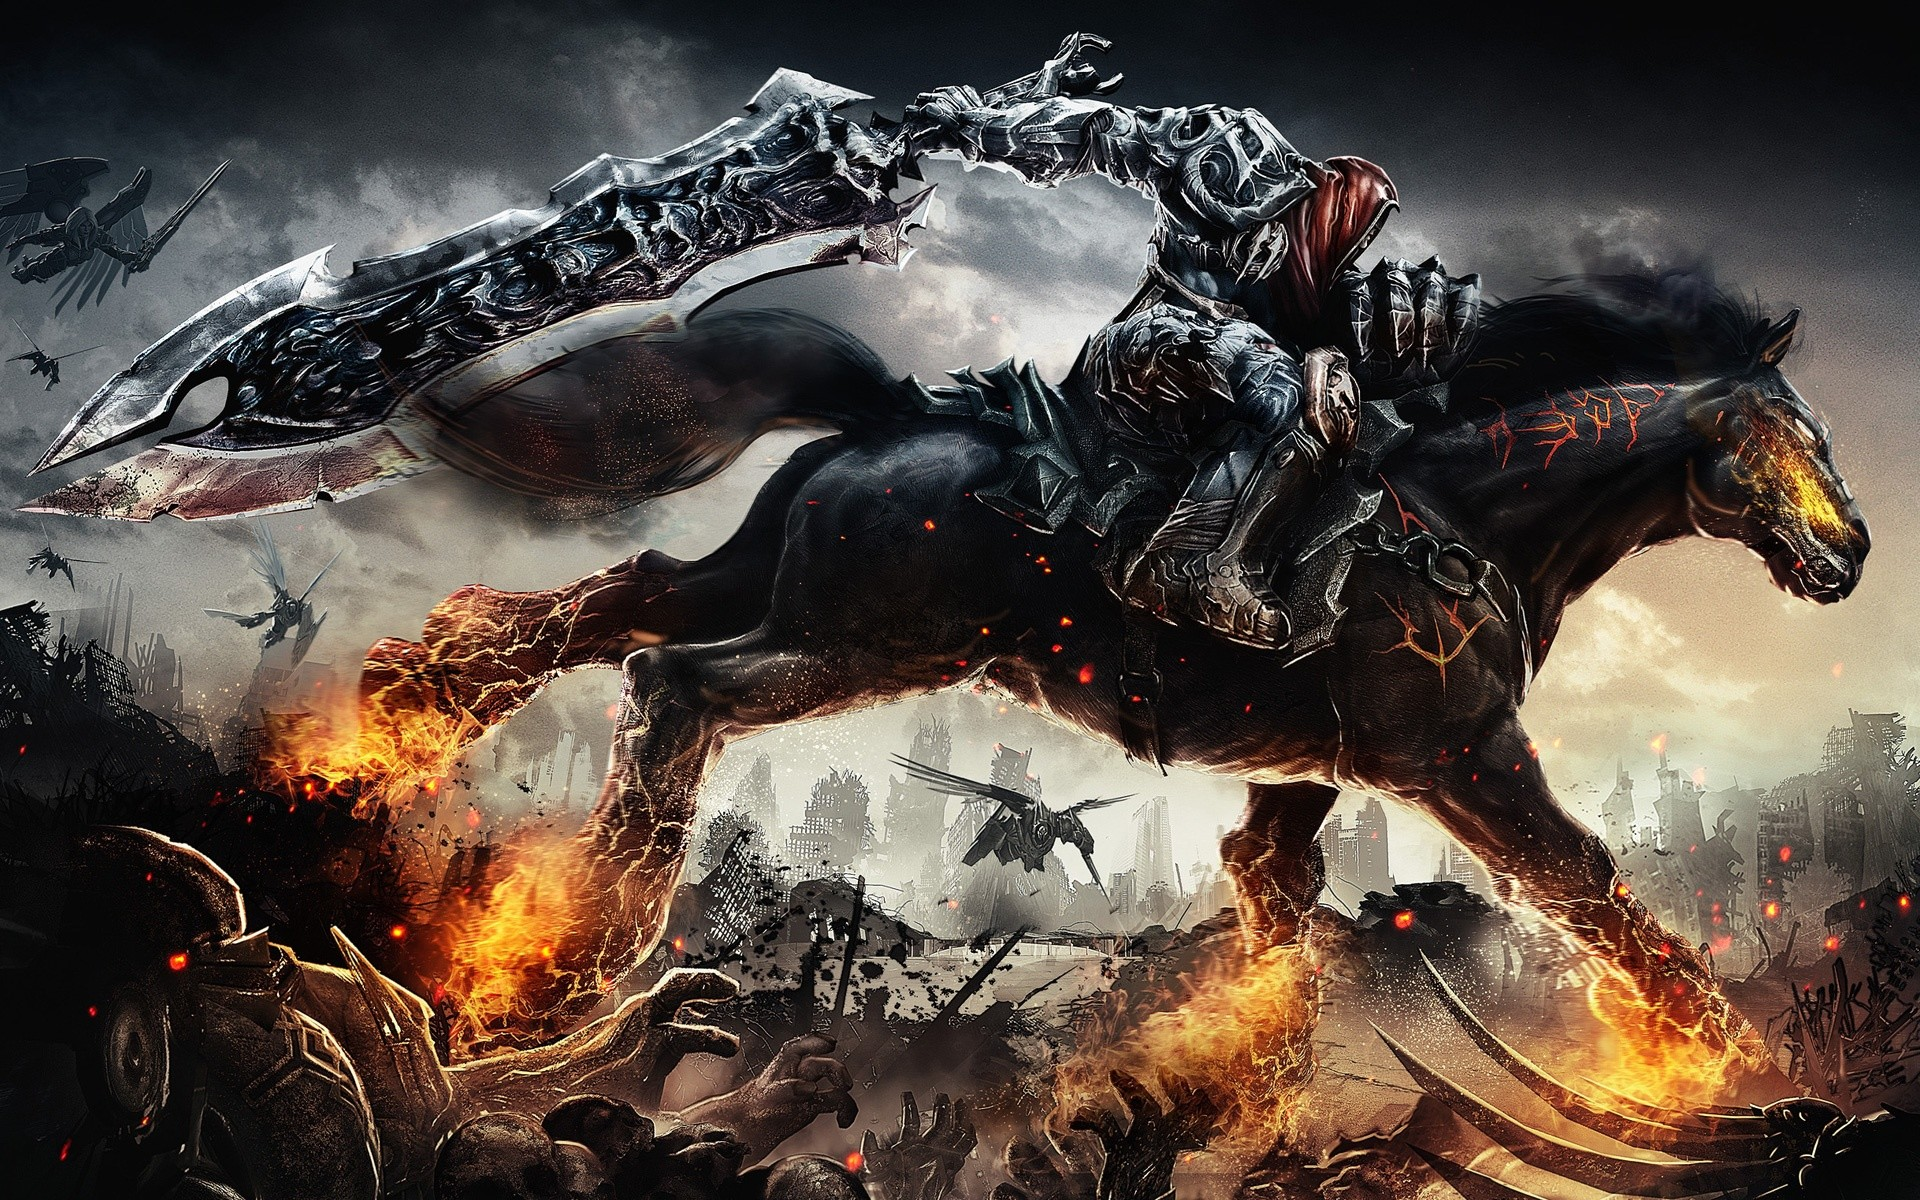 Darksiders wallpaper Wrath of War. Dark HD wallpaper of horseman from  Darksiders Wrath of War game.